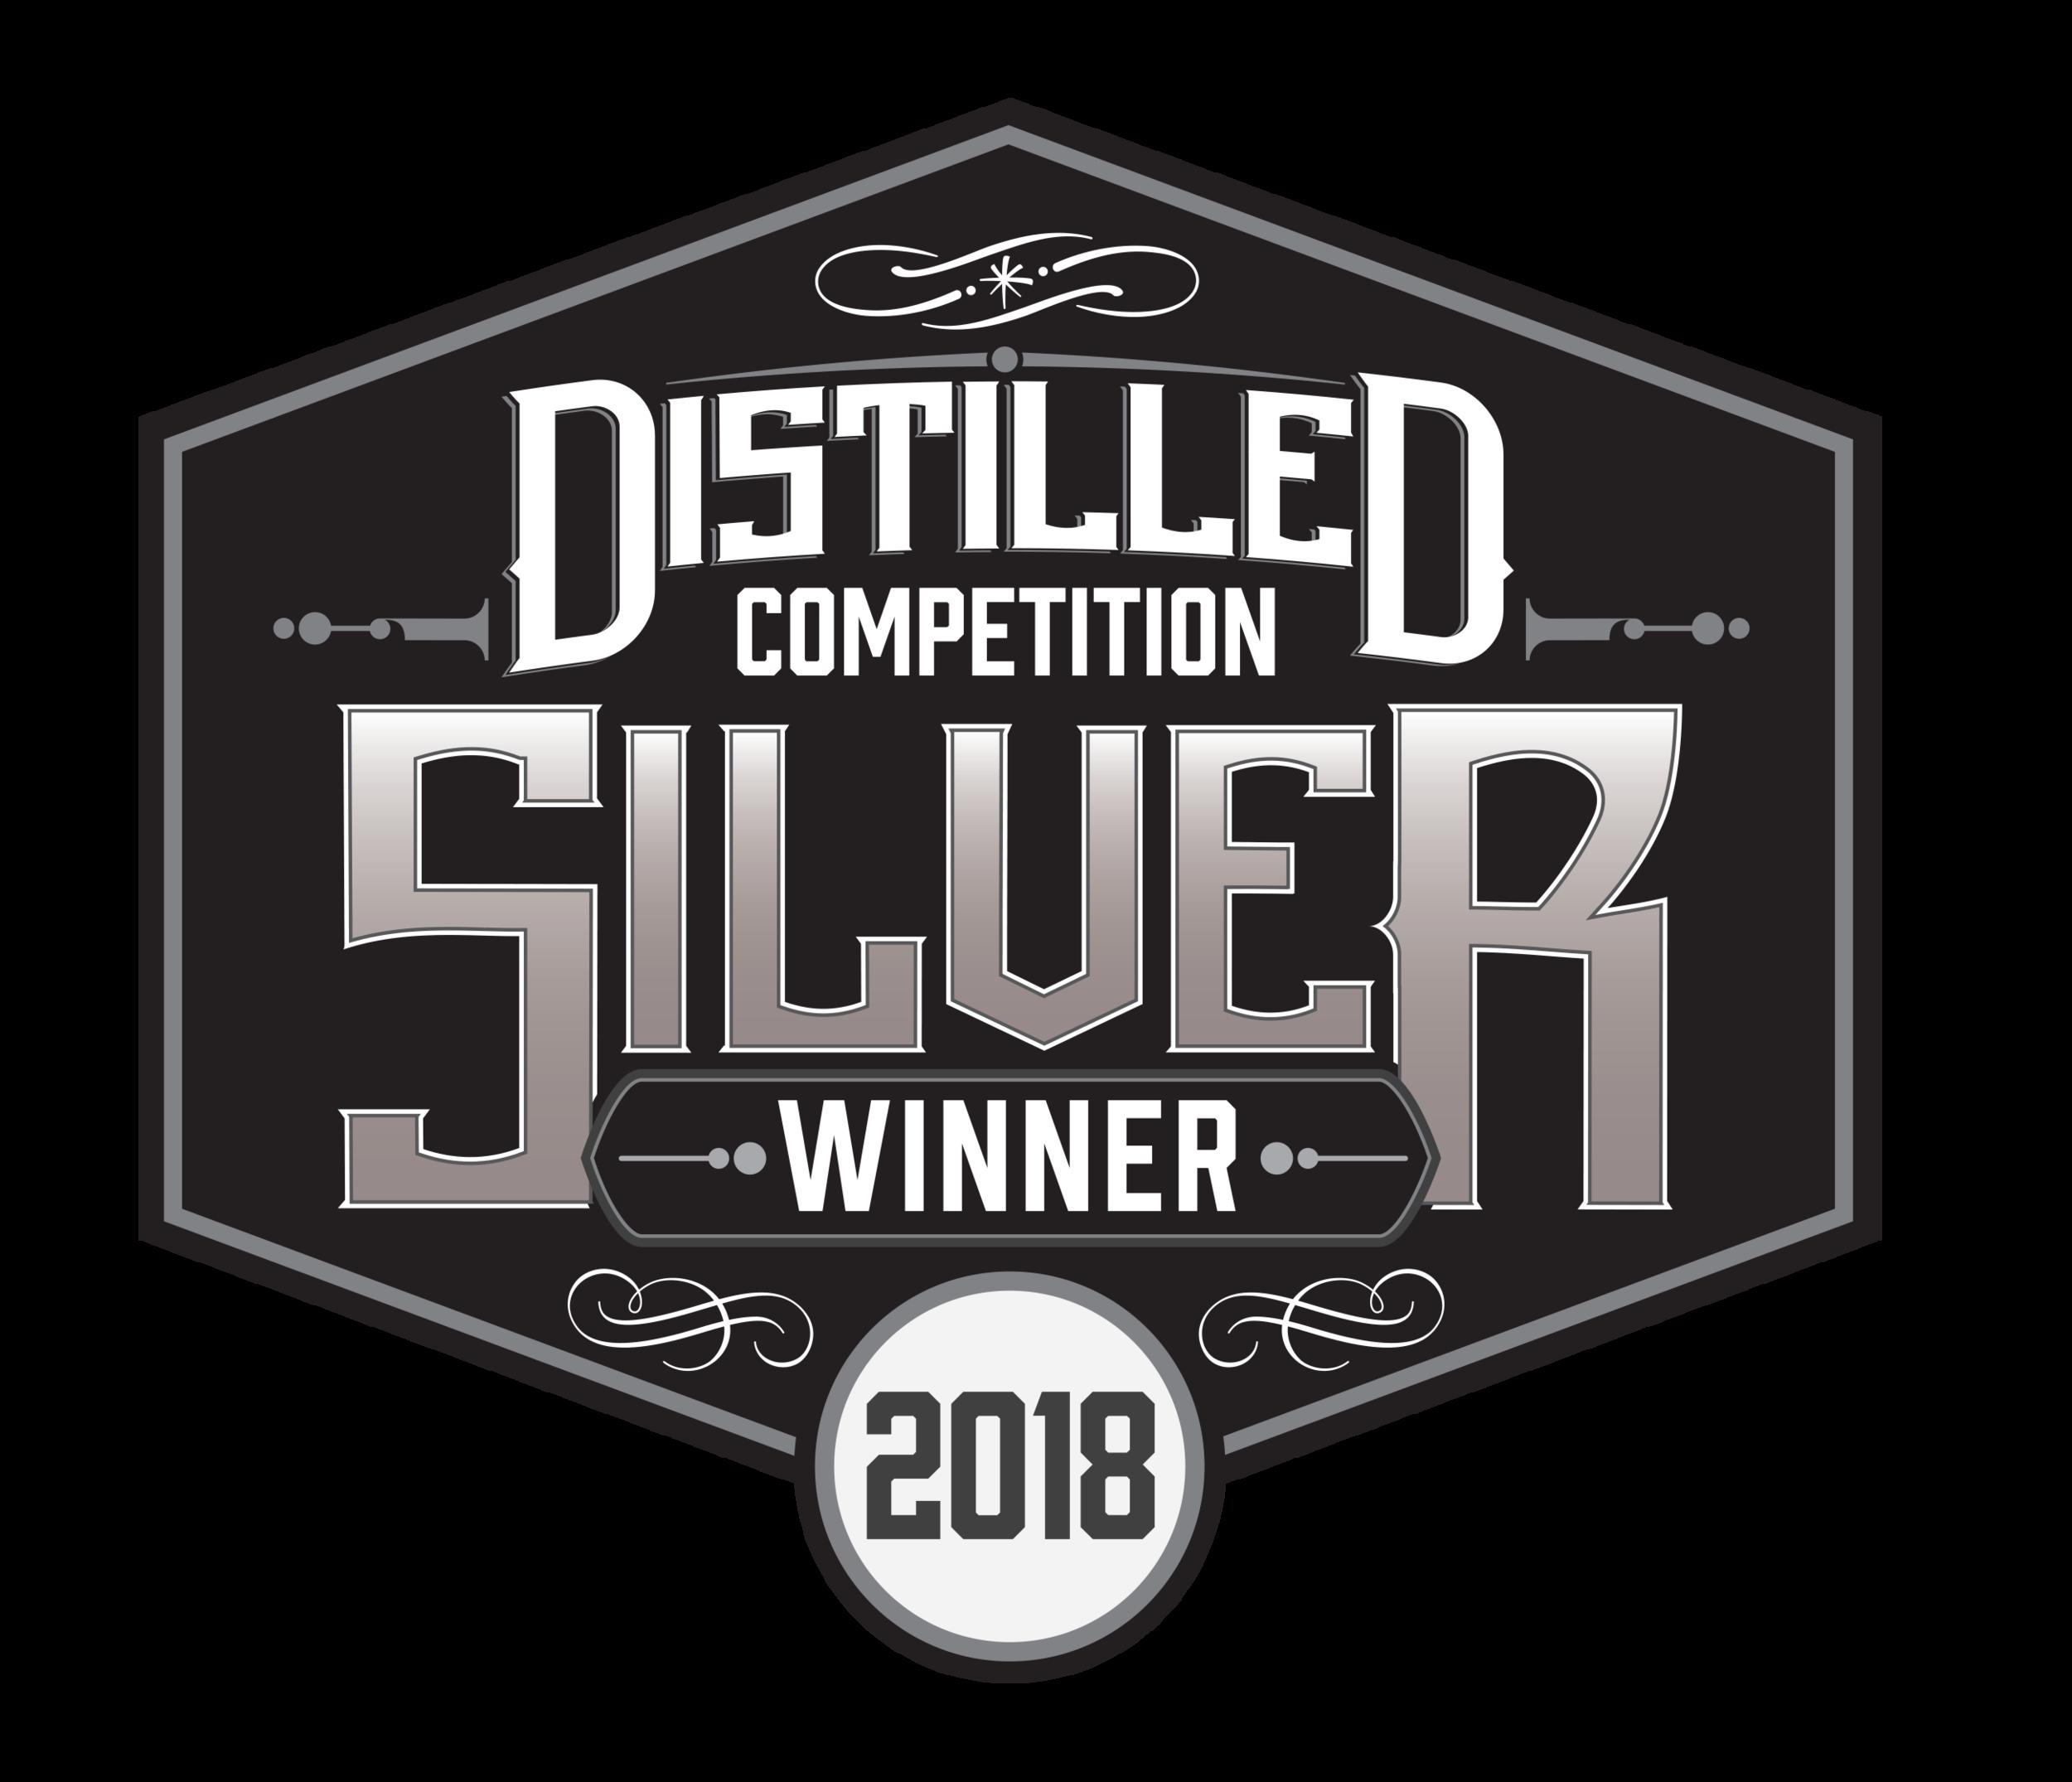 Wild Rag® MESQUITE BEAN VODKA (750ml & 50ml) -  The first and ONLY Distillery in the World making a Specialty Premium Mesquite Bean Vodka - Award WINNER!